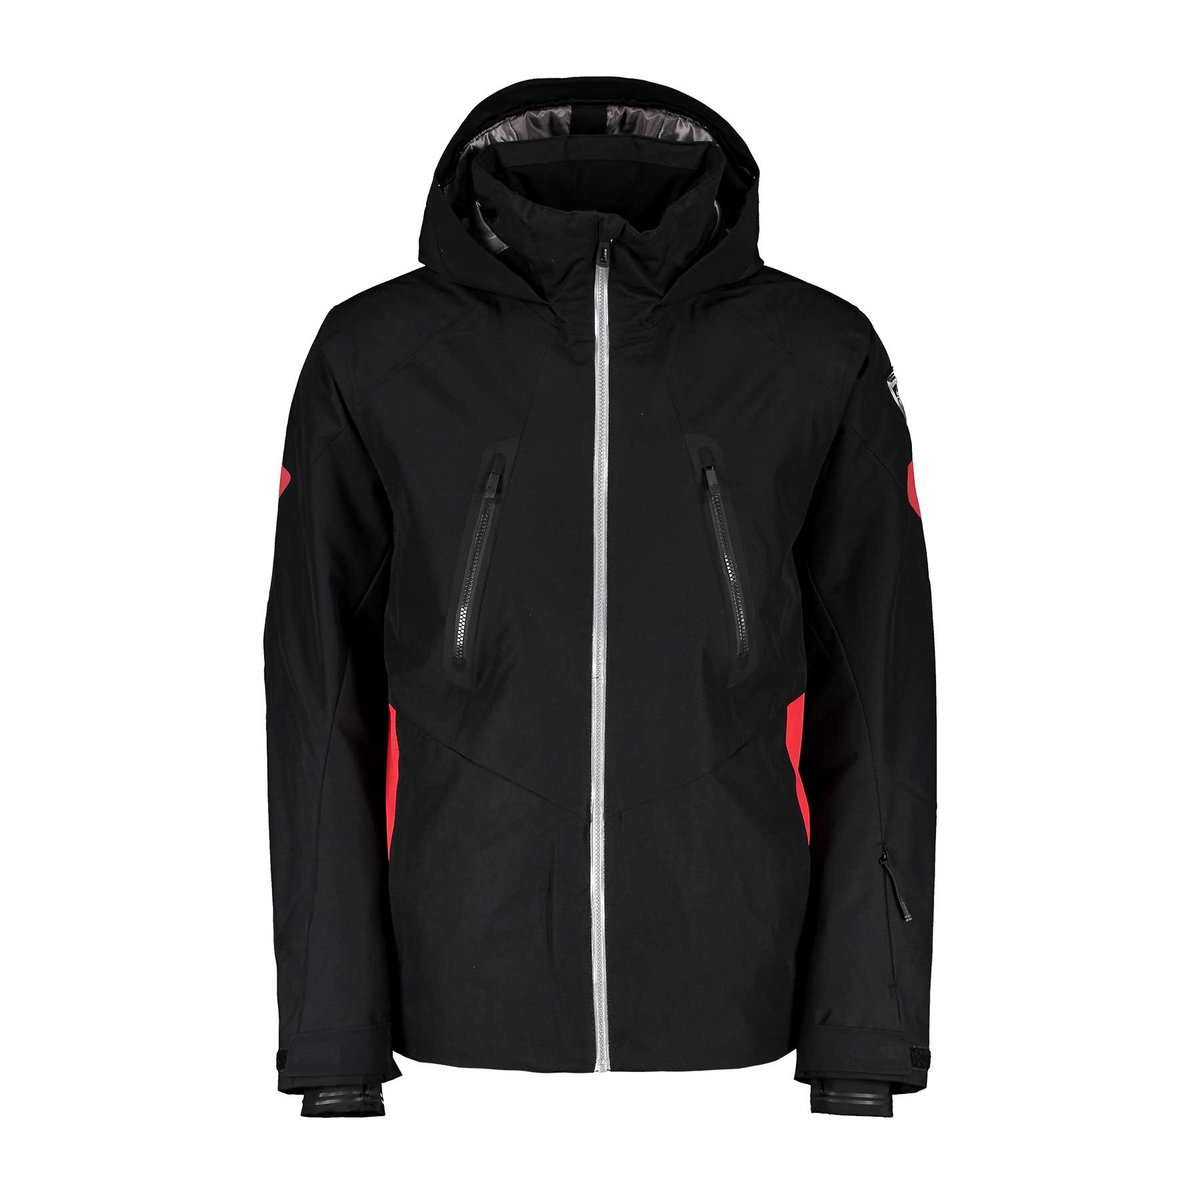 _PREMANUFACTURE_PRICE Rossignol completo giacca fonction + pantaloni ski